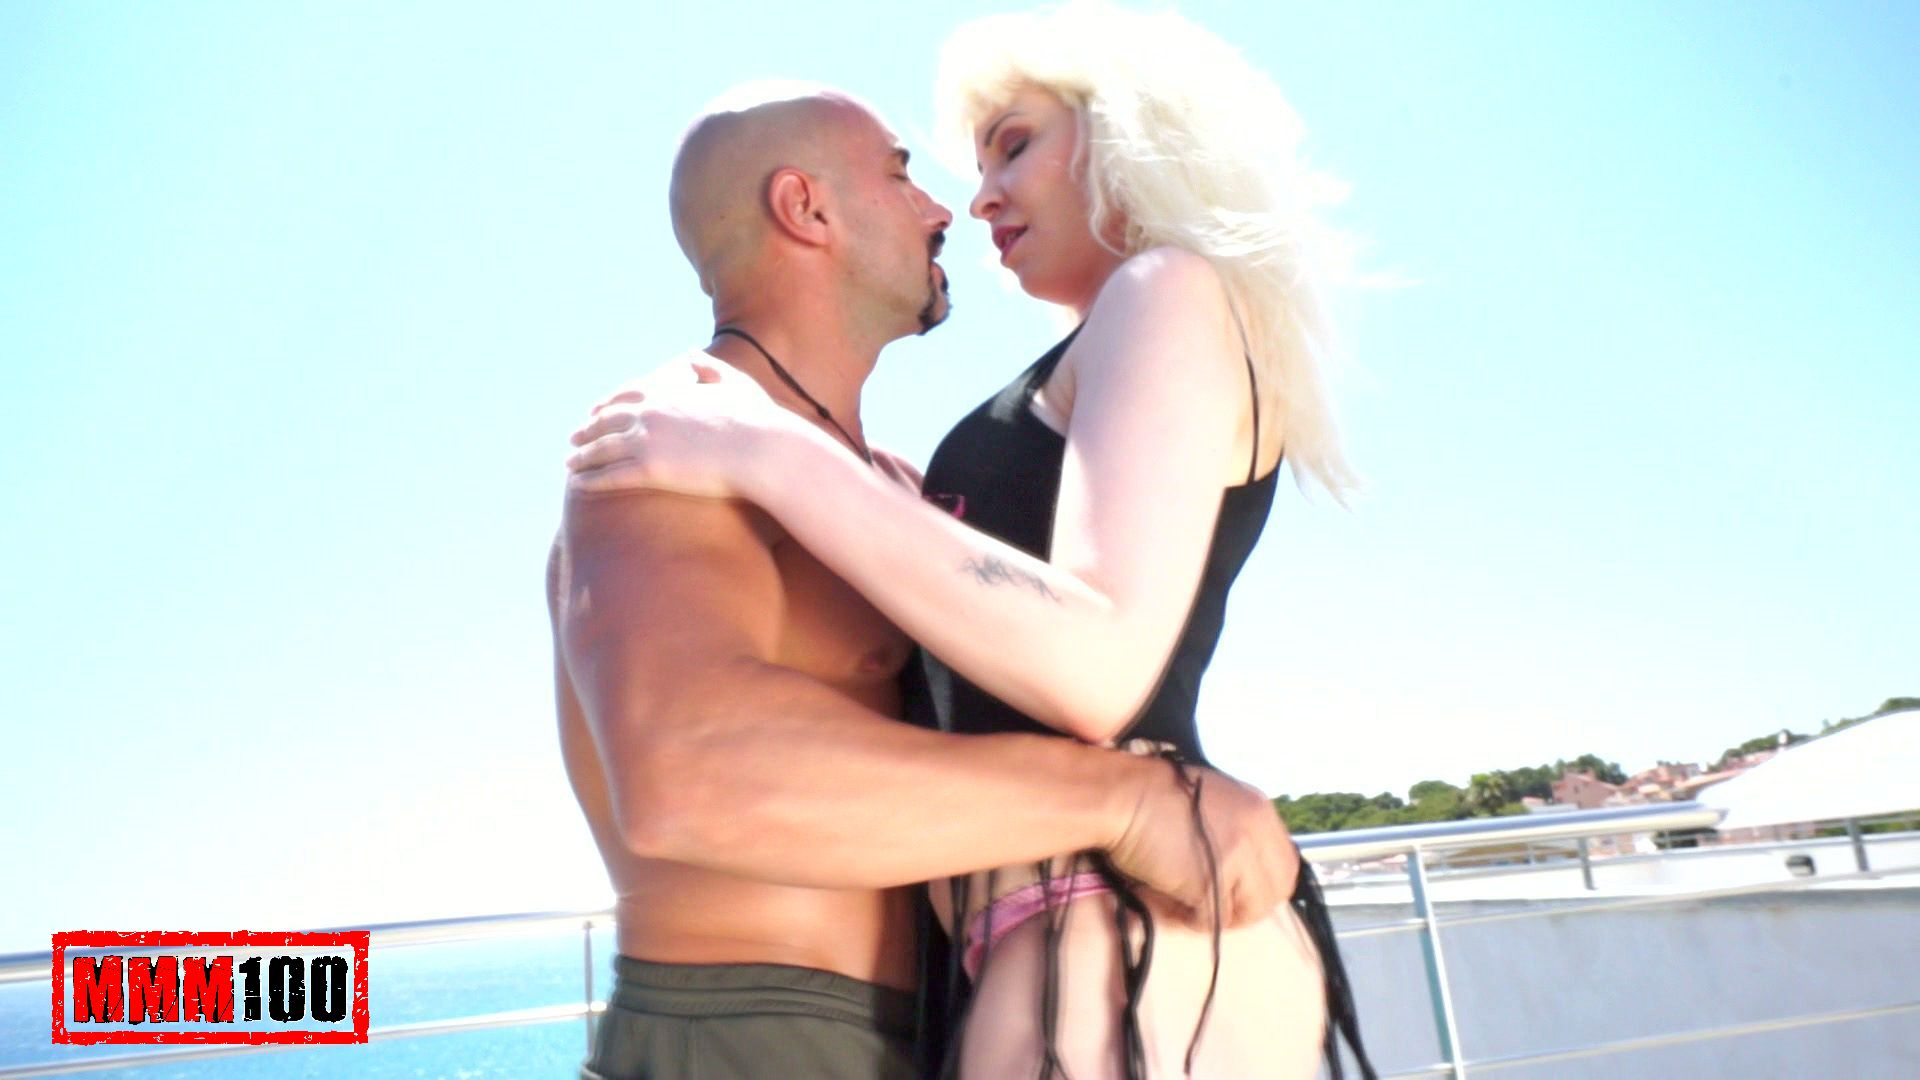 Tiina Ok & Bryan Da Ferro In The Ghost Of The Pool – Mmm100